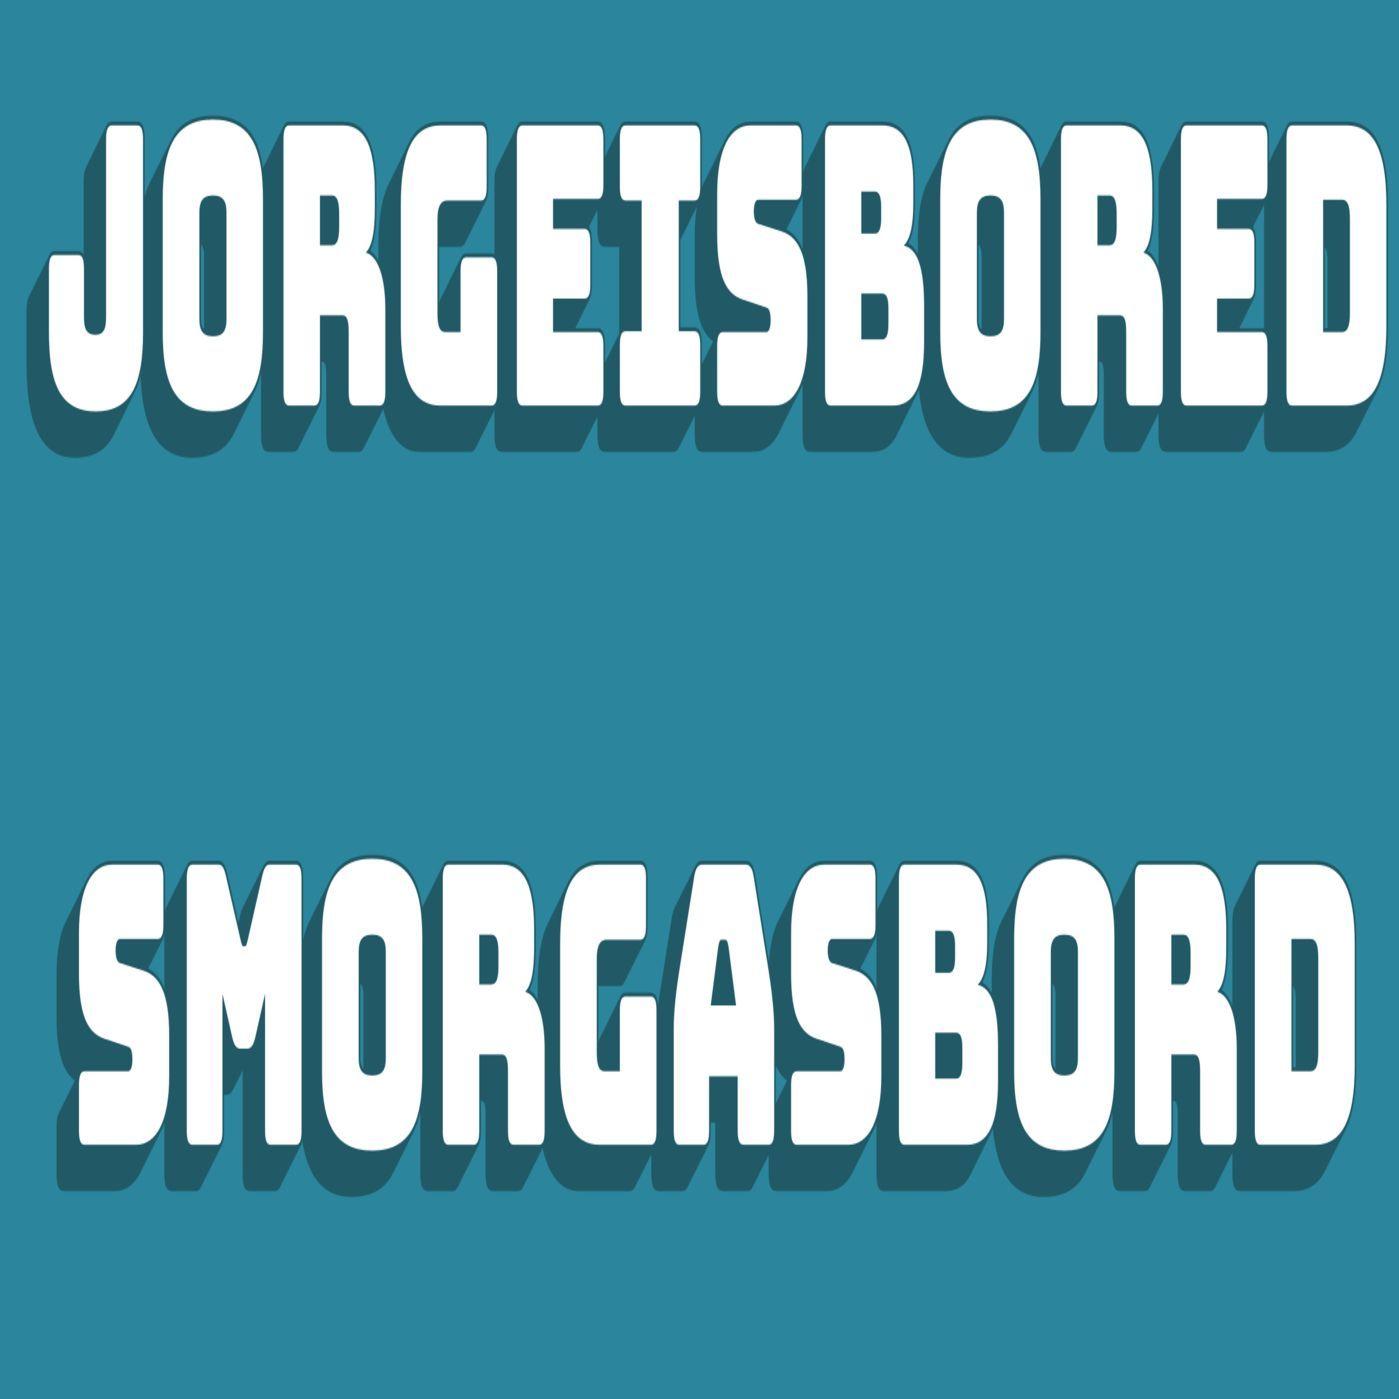 Sexy Robots | JorgeIsBored Smorgasbord #2